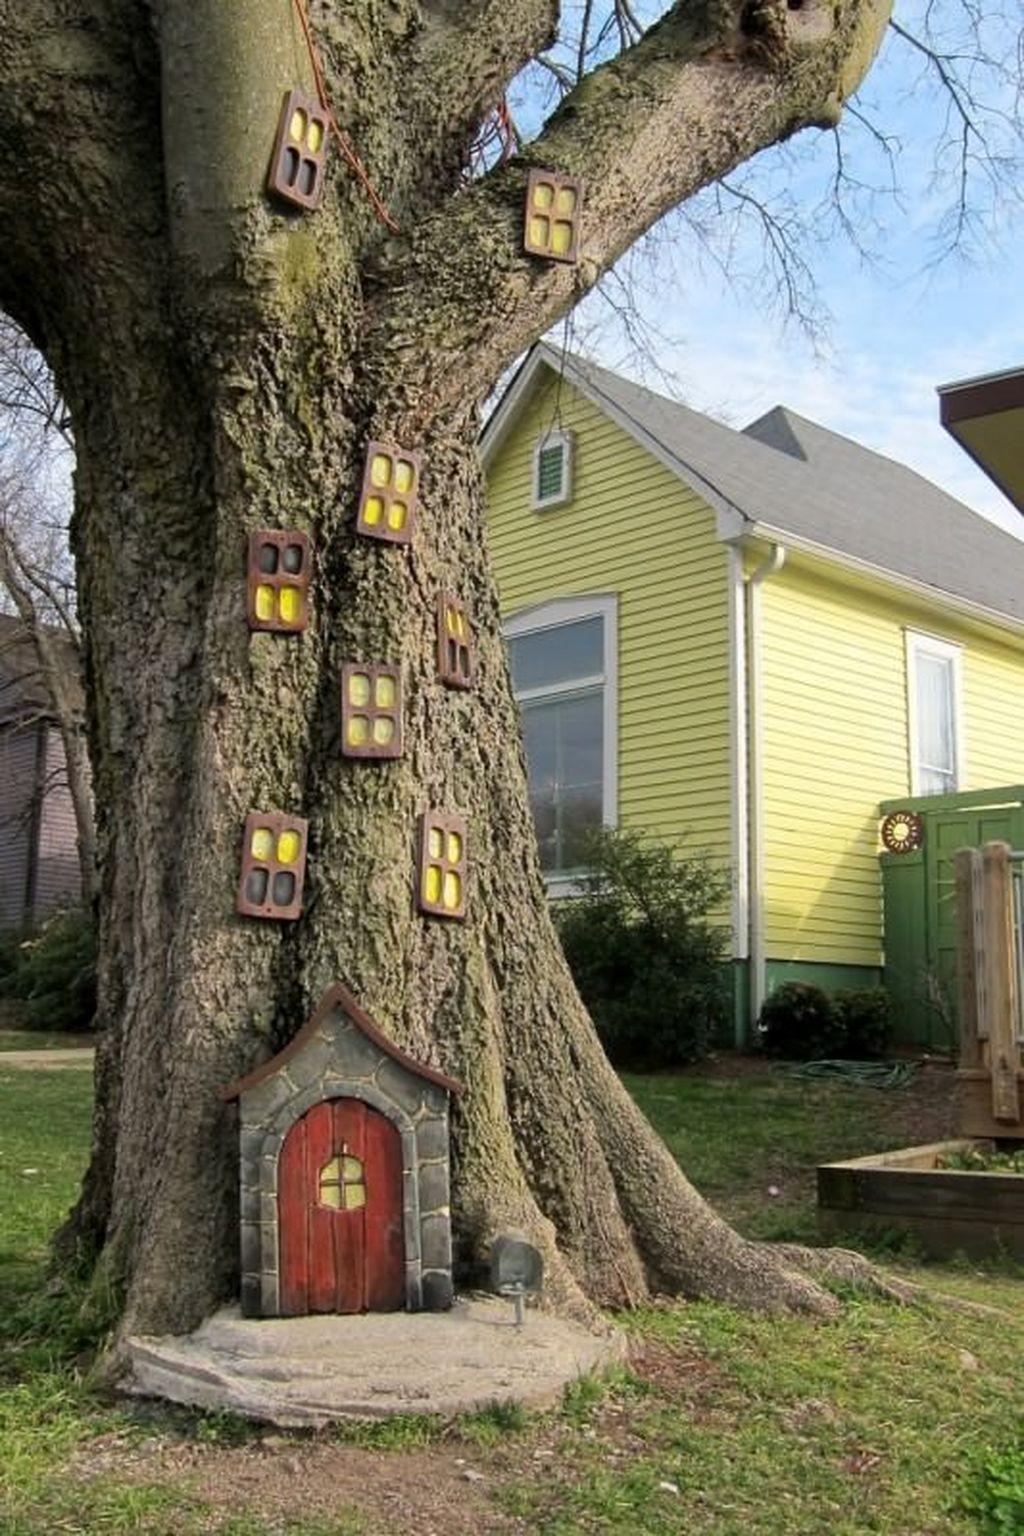 Creepy But Creative DIY Halloween Outdoor Decoration Ideas 02